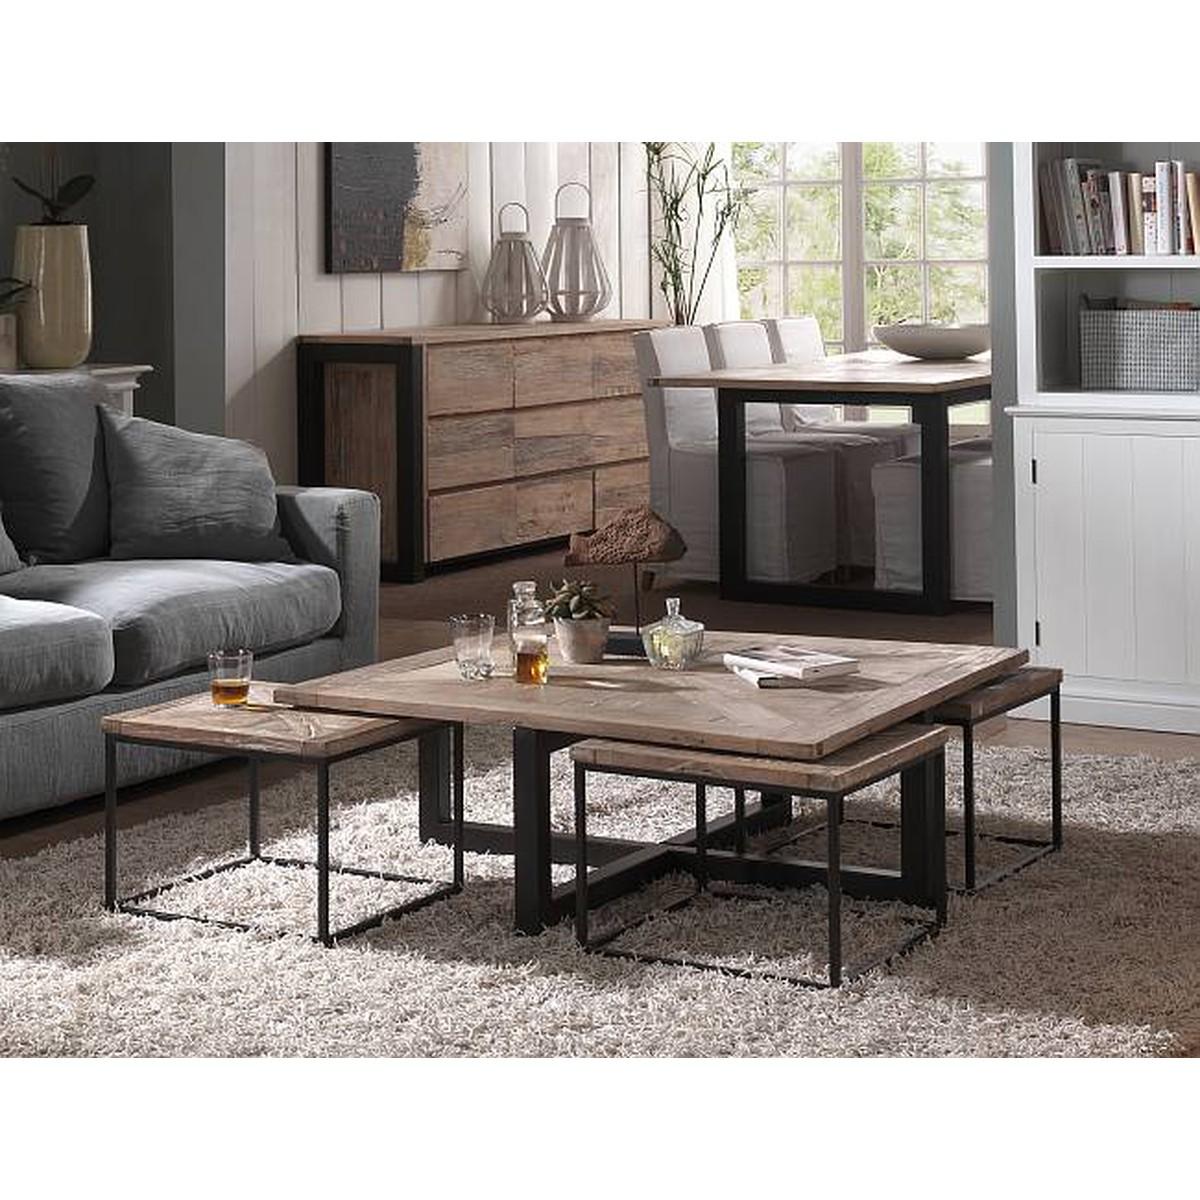 pr interiors florida table basse florida avec 4 tables gigognes 110x110x40cm schilliger. Black Bedroom Furniture Sets. Home Design Ideas